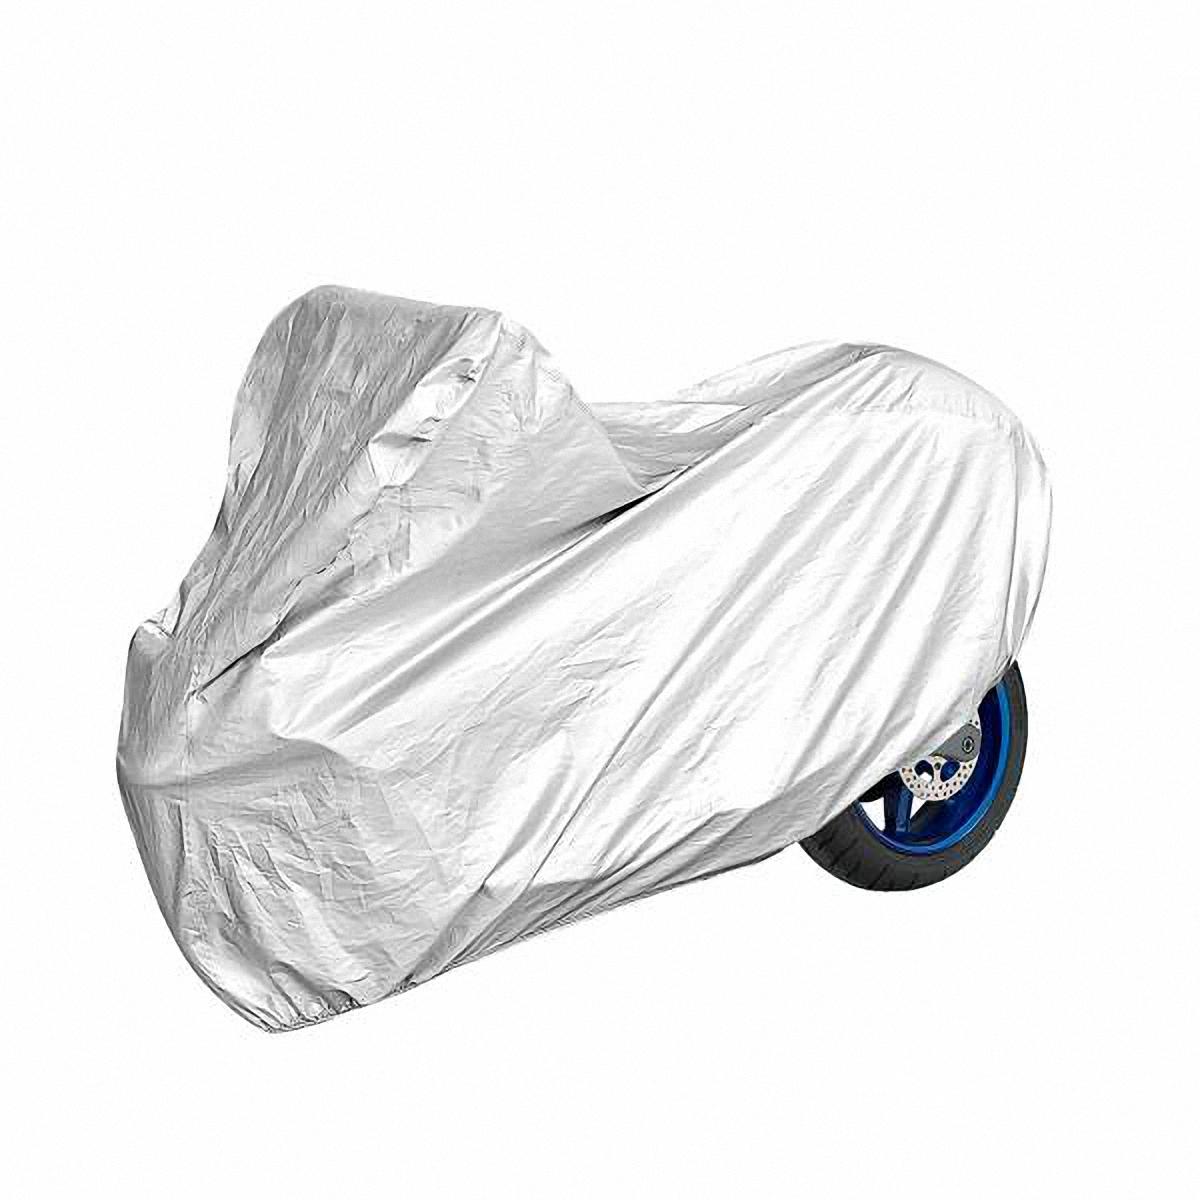 Чехол-тент на мотоцикл Skyway, 203 х 89 119 см. Размер M